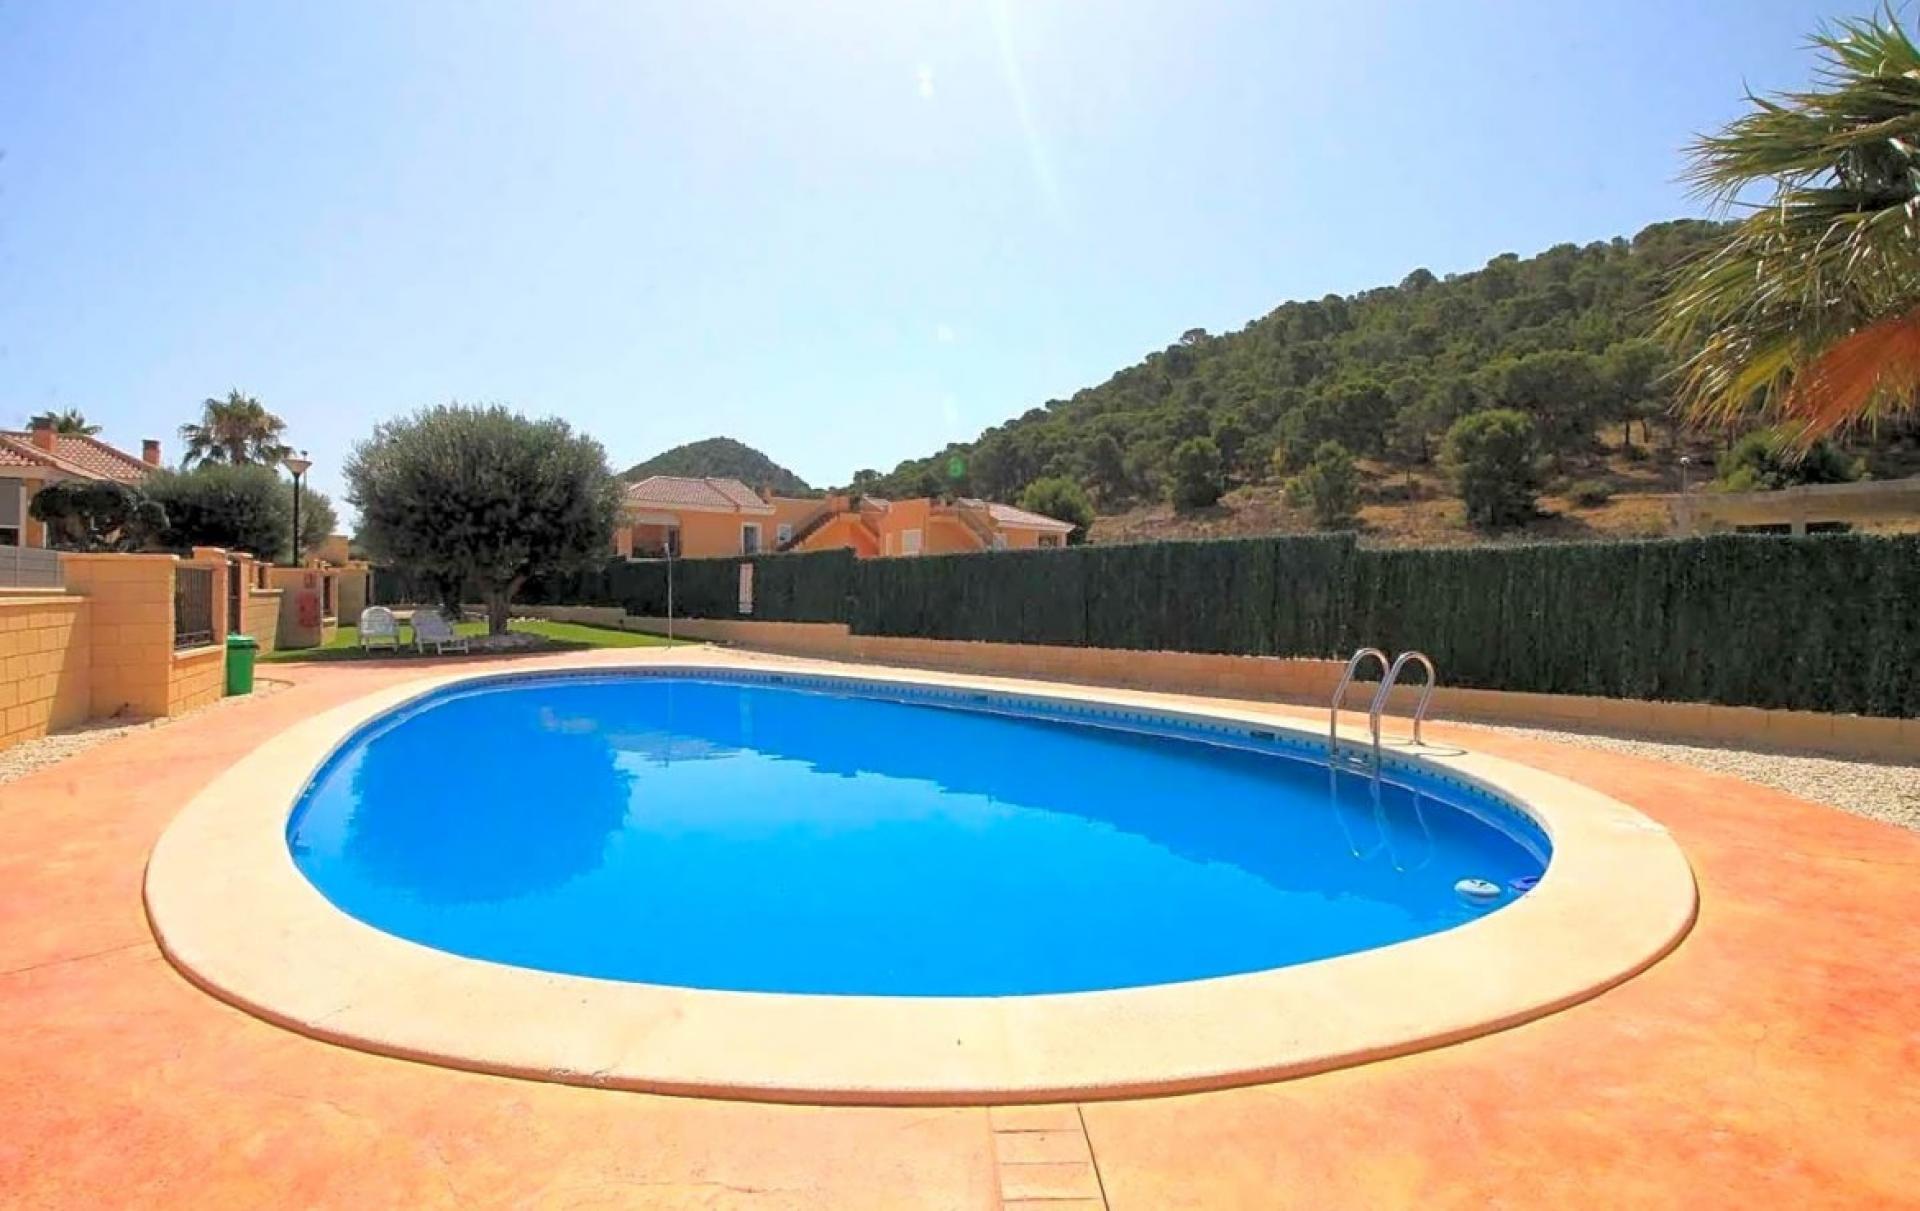 Goedkope vrijstaande woning te koop binnenland Alicante in Medvilla Spanje